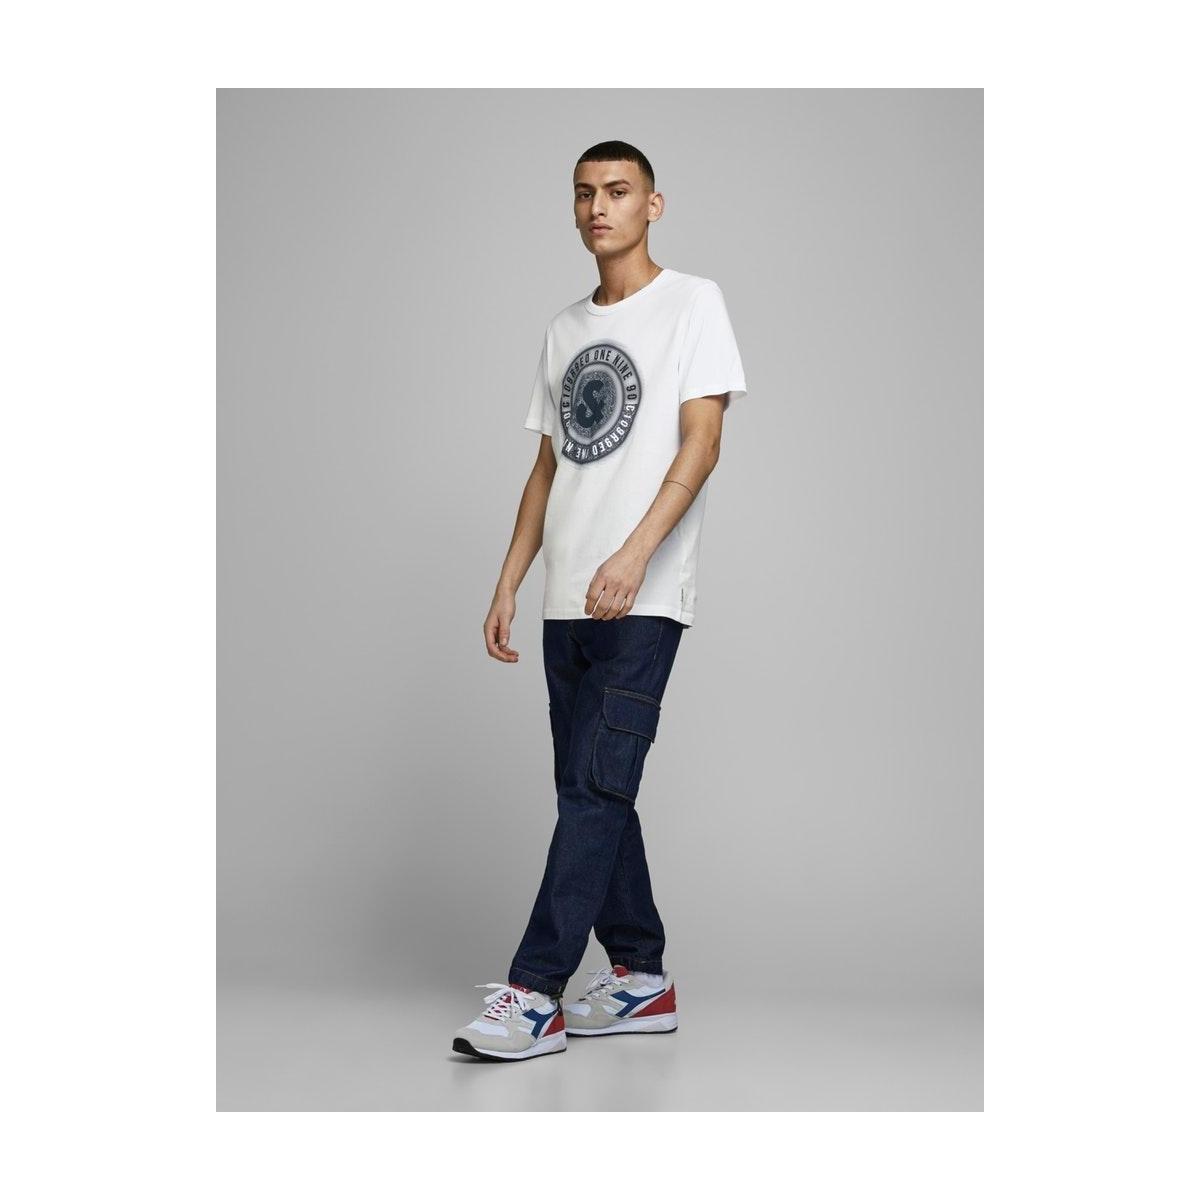 jcologo-universe tee ss crew  neck 12172273 jack & jones t-shirt white/slim/uni